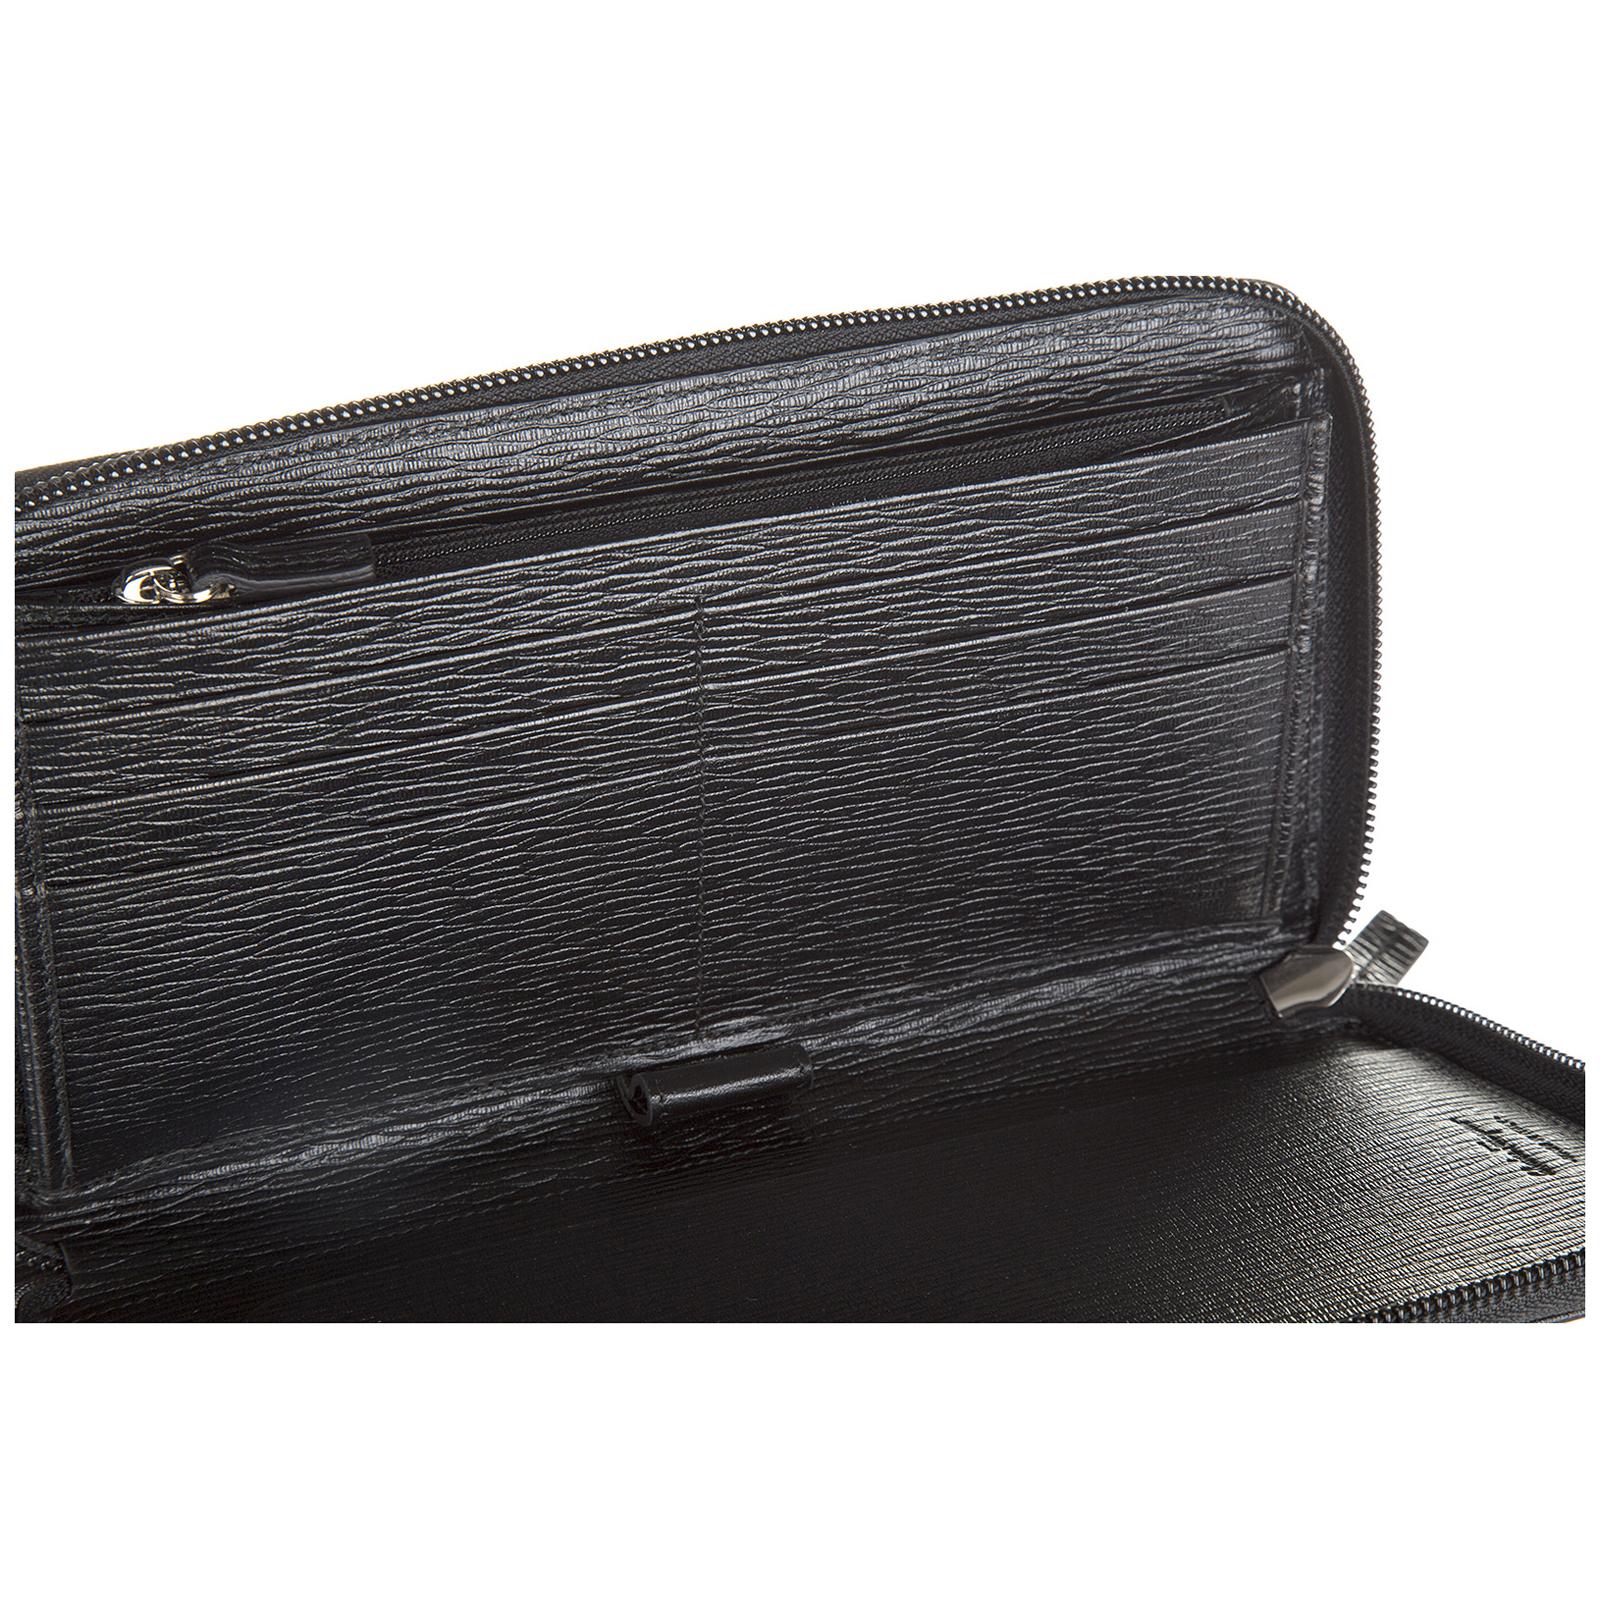 Women's wallet genuine leather coin case holder purse card bifold